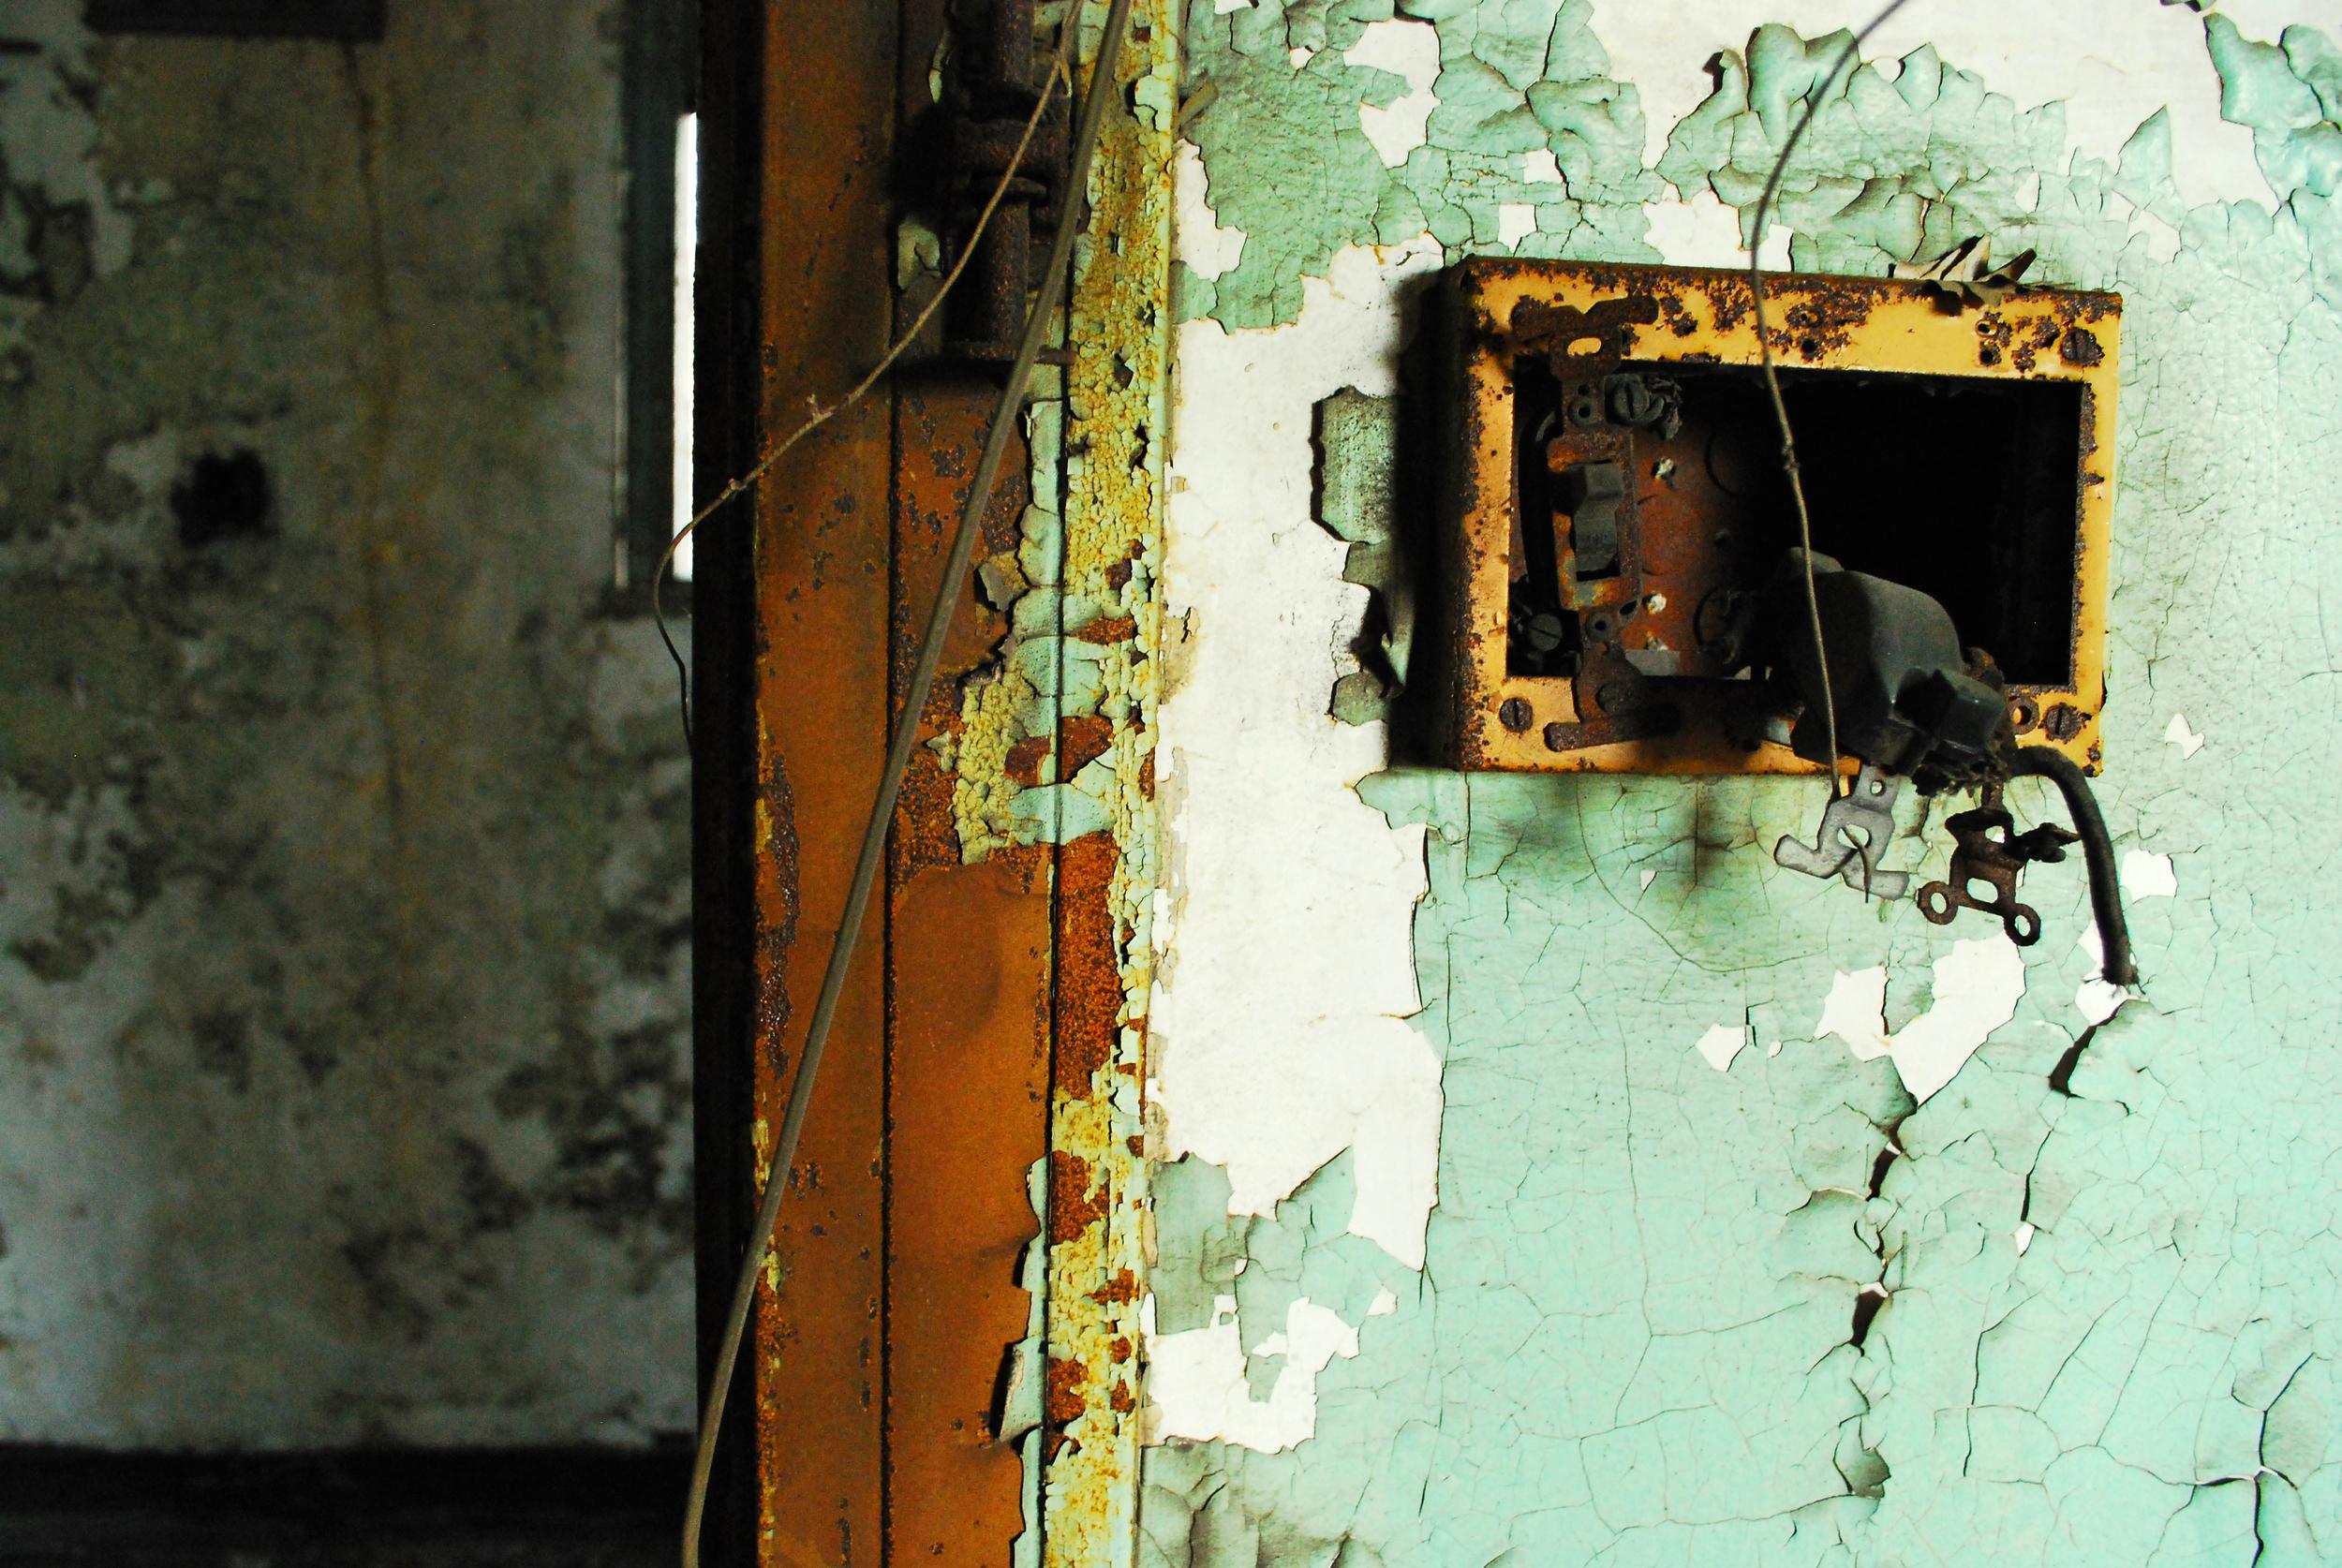 TELEPHONE OPERATOR ROOM, INDIANA  2009